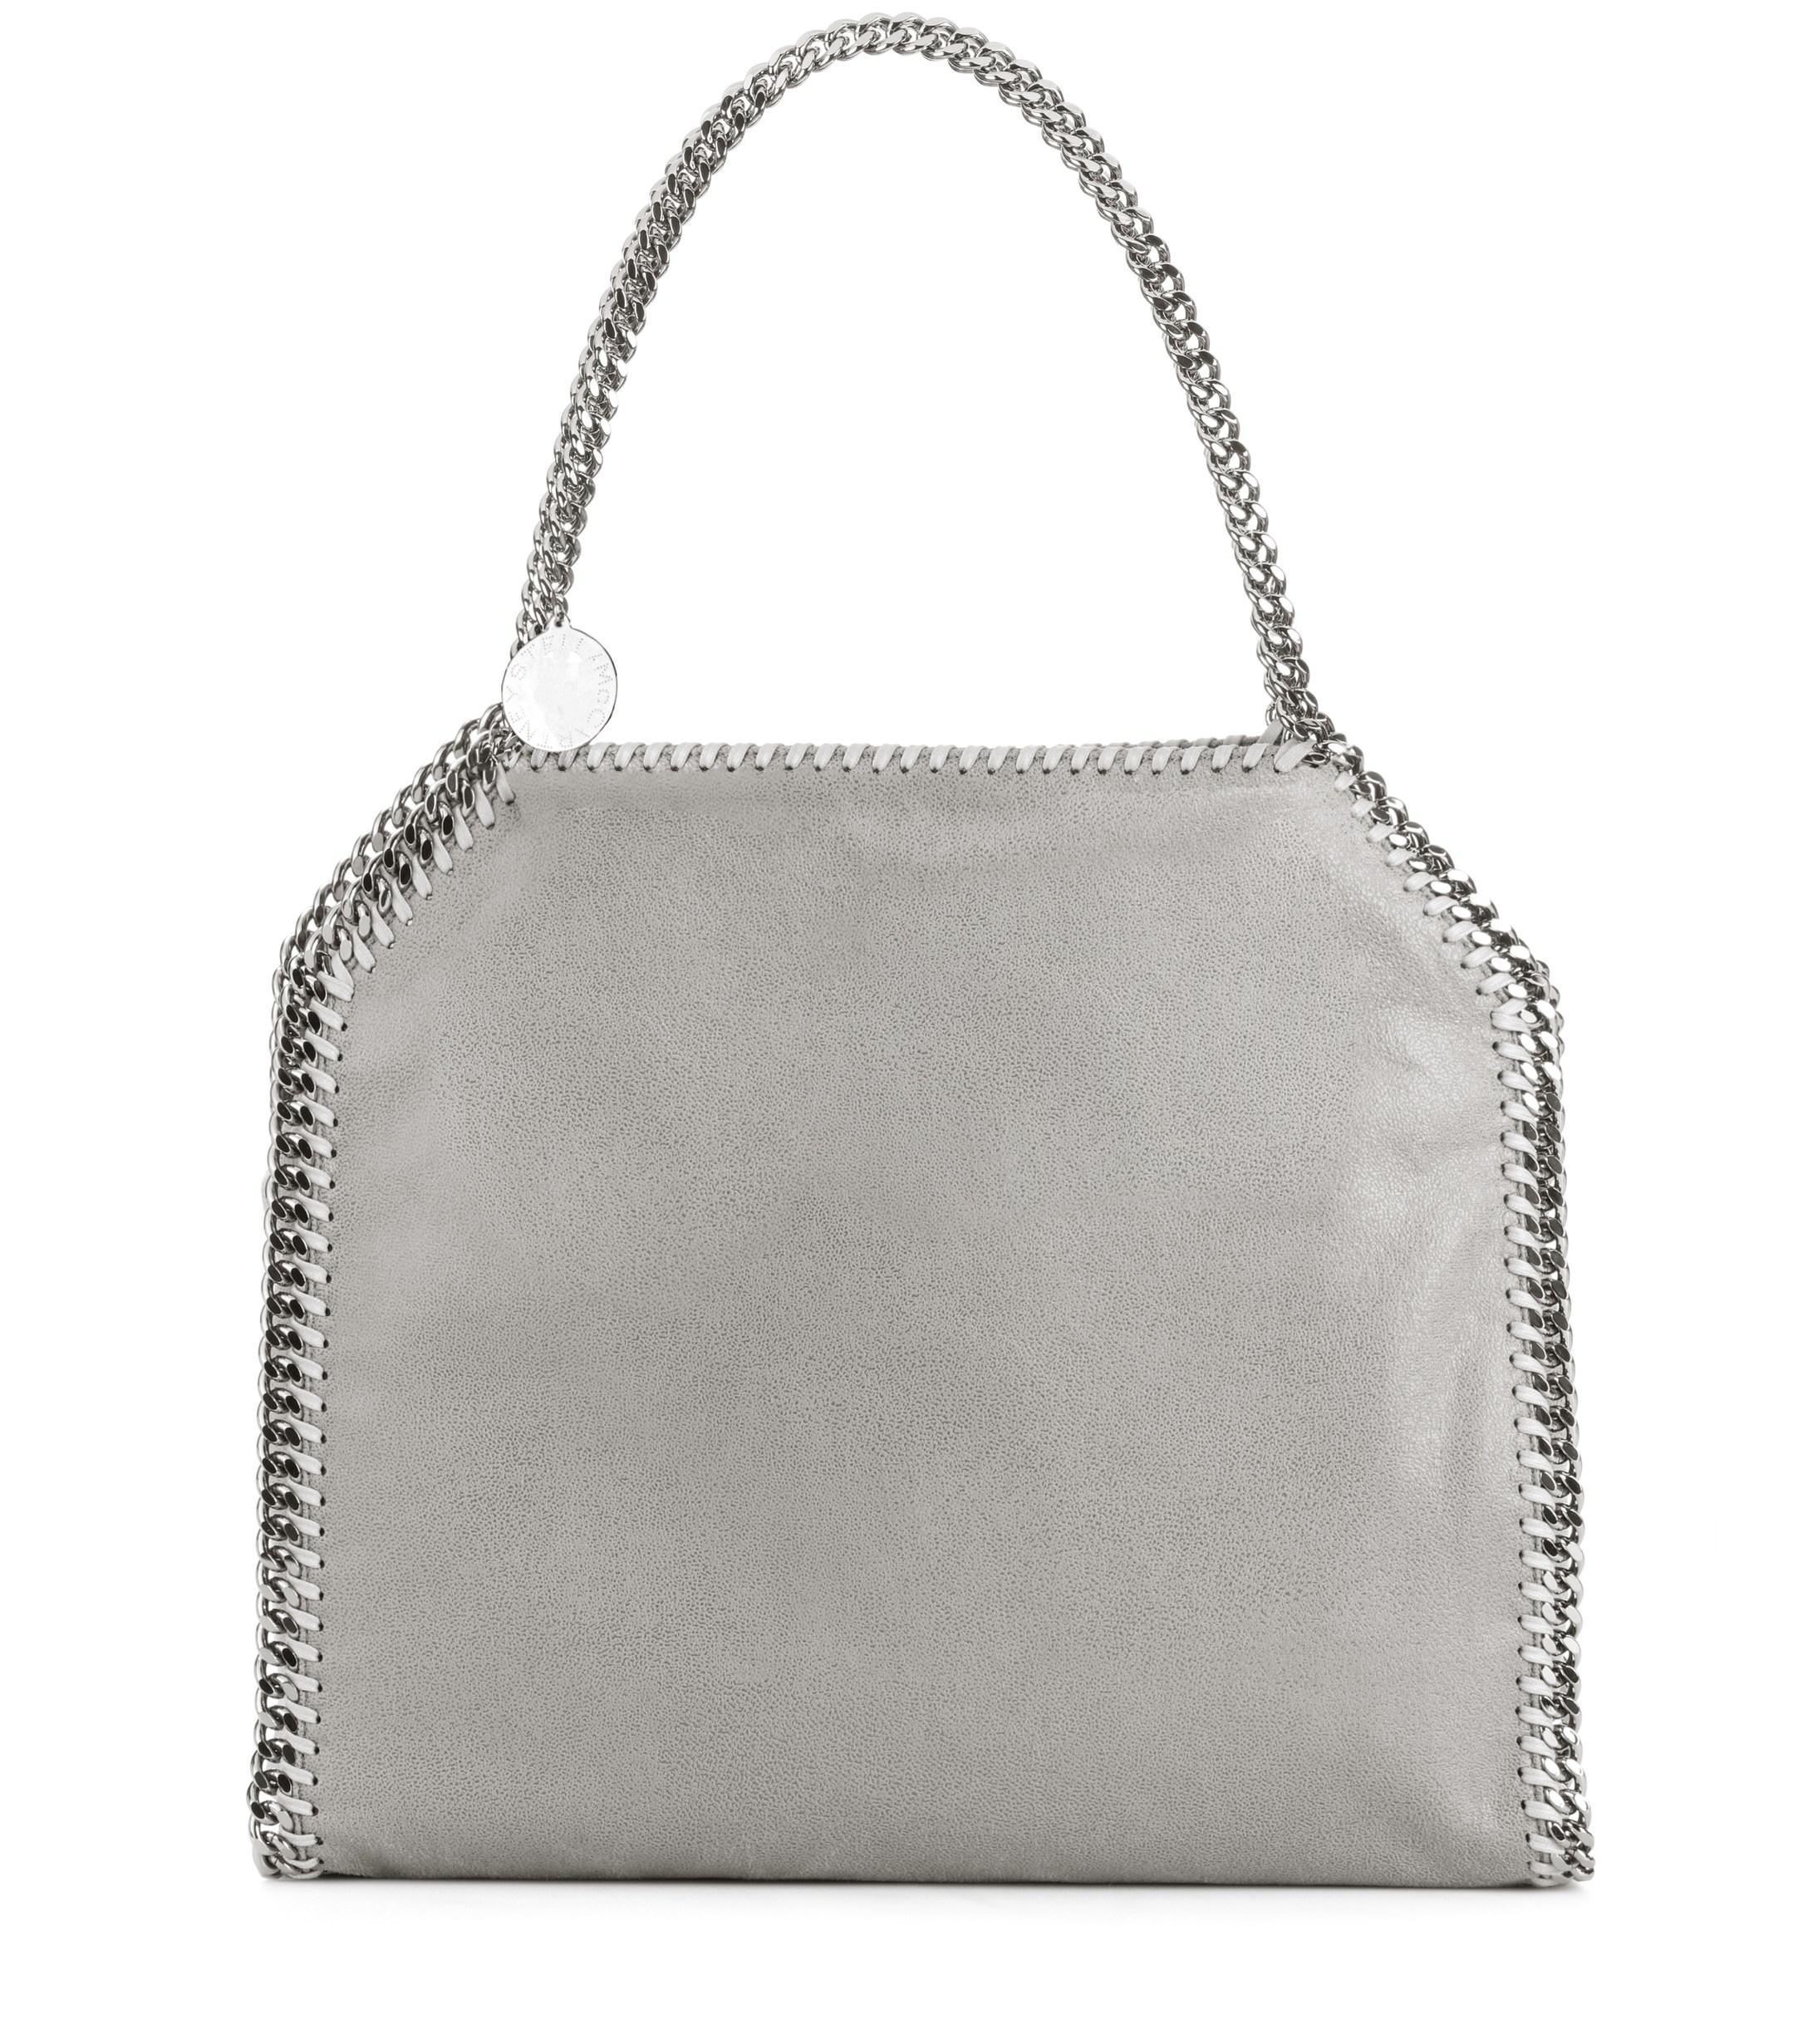 39379817e9a0 Lyst - Stella McCartney Small Falabella Shaggy Deer Shoulder Bag in Gray